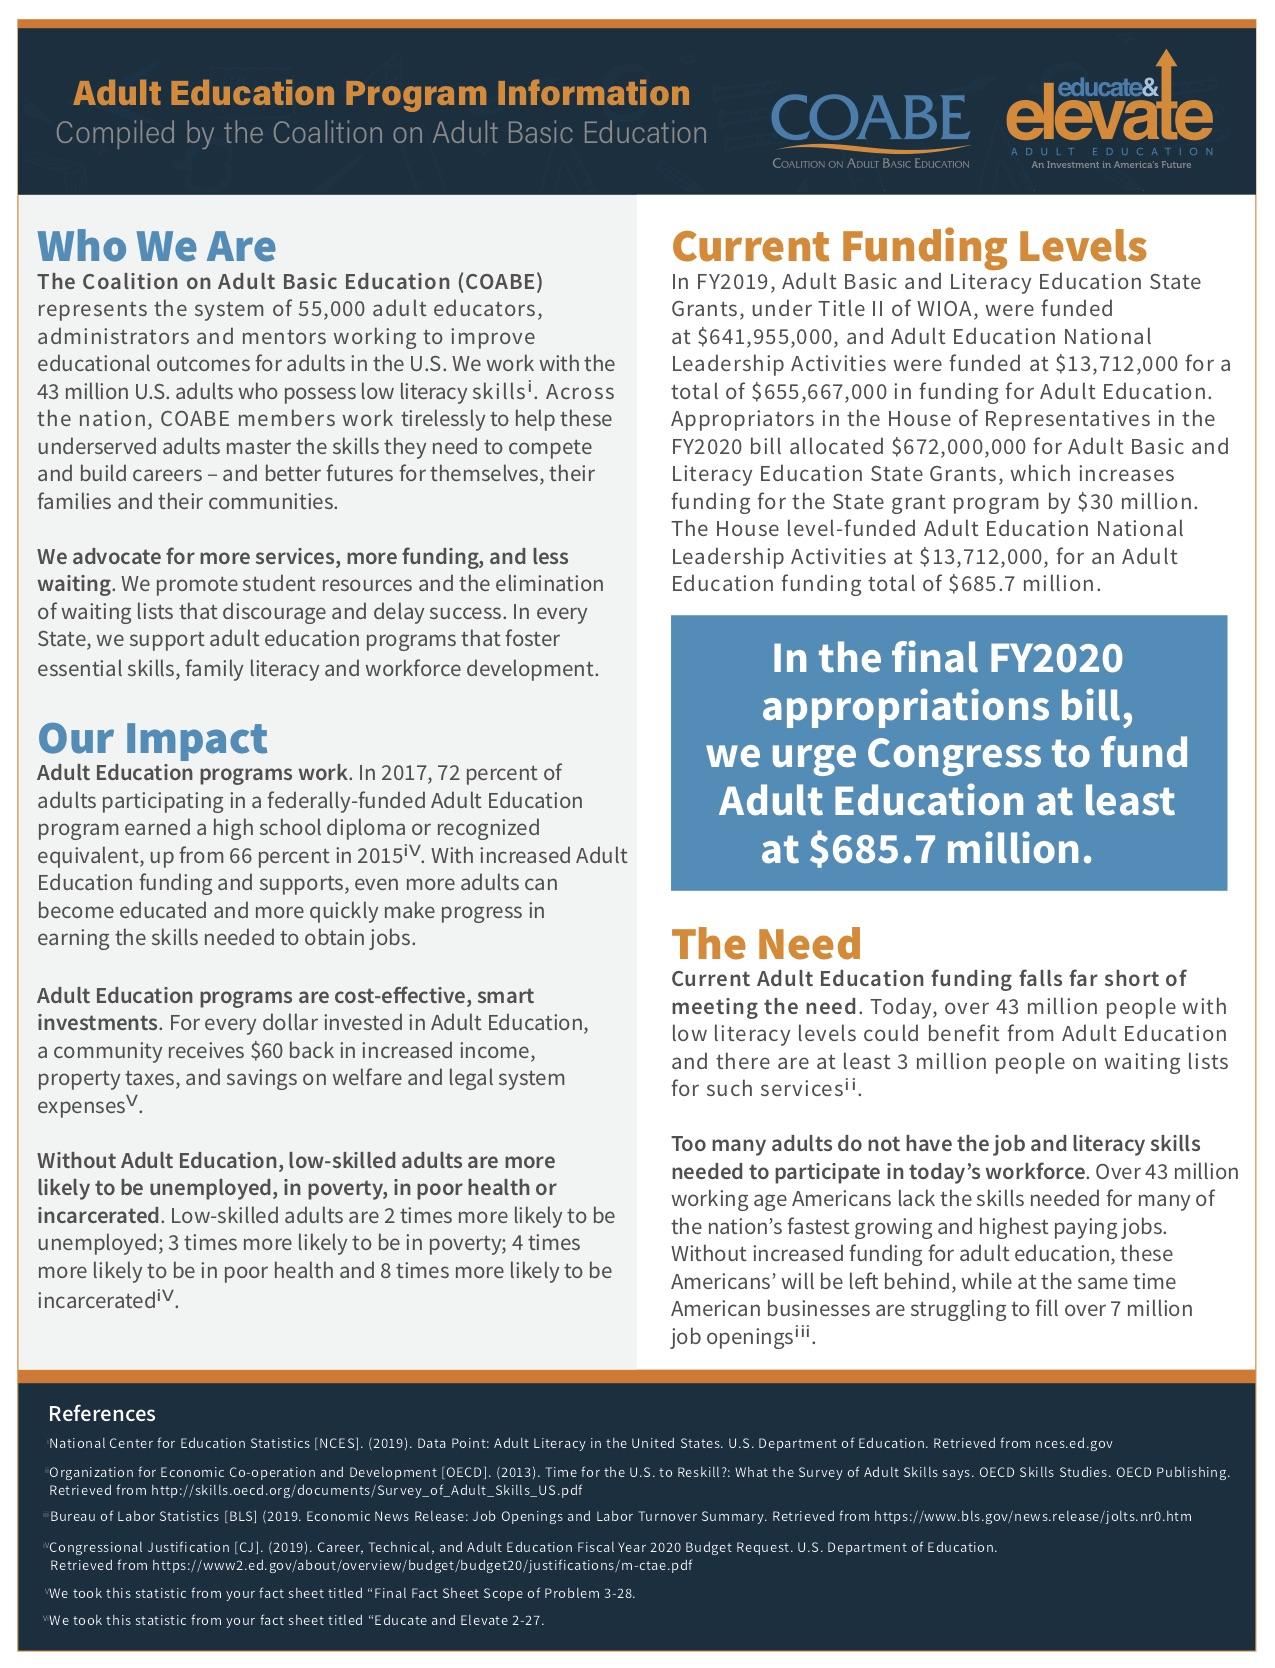 Educate & Elevate Data sheet